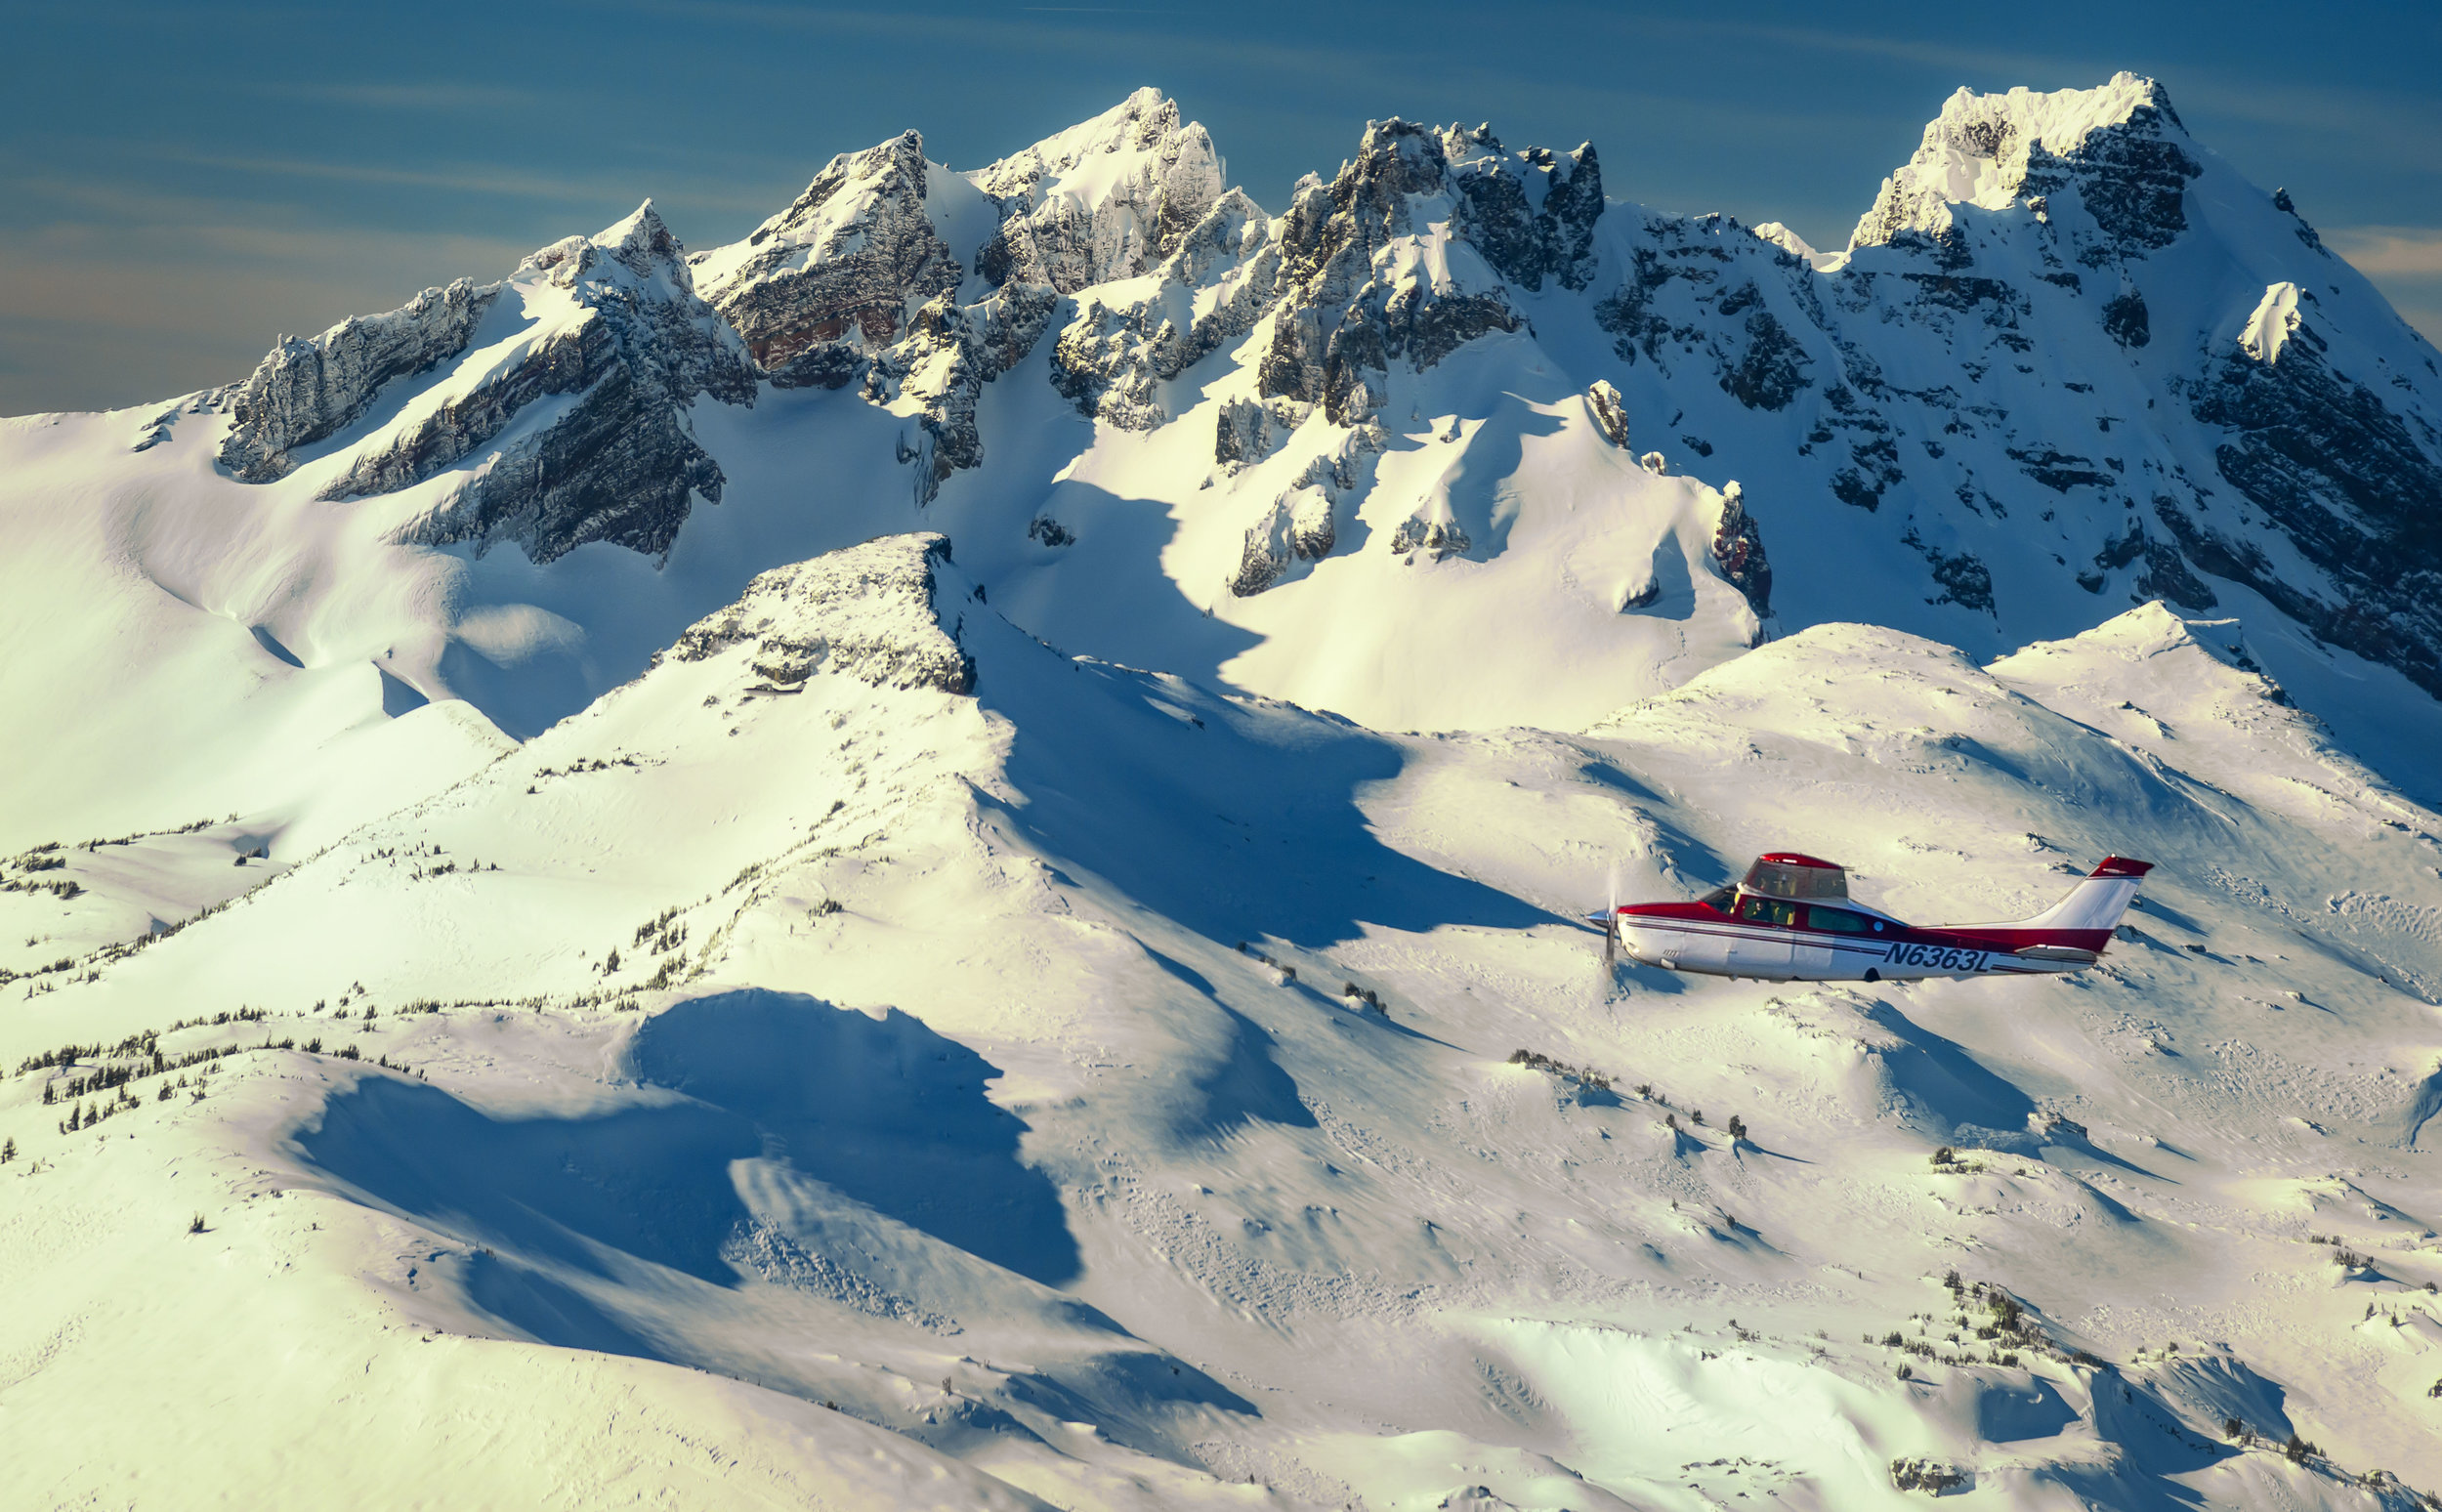 Plane-5sm.jpg